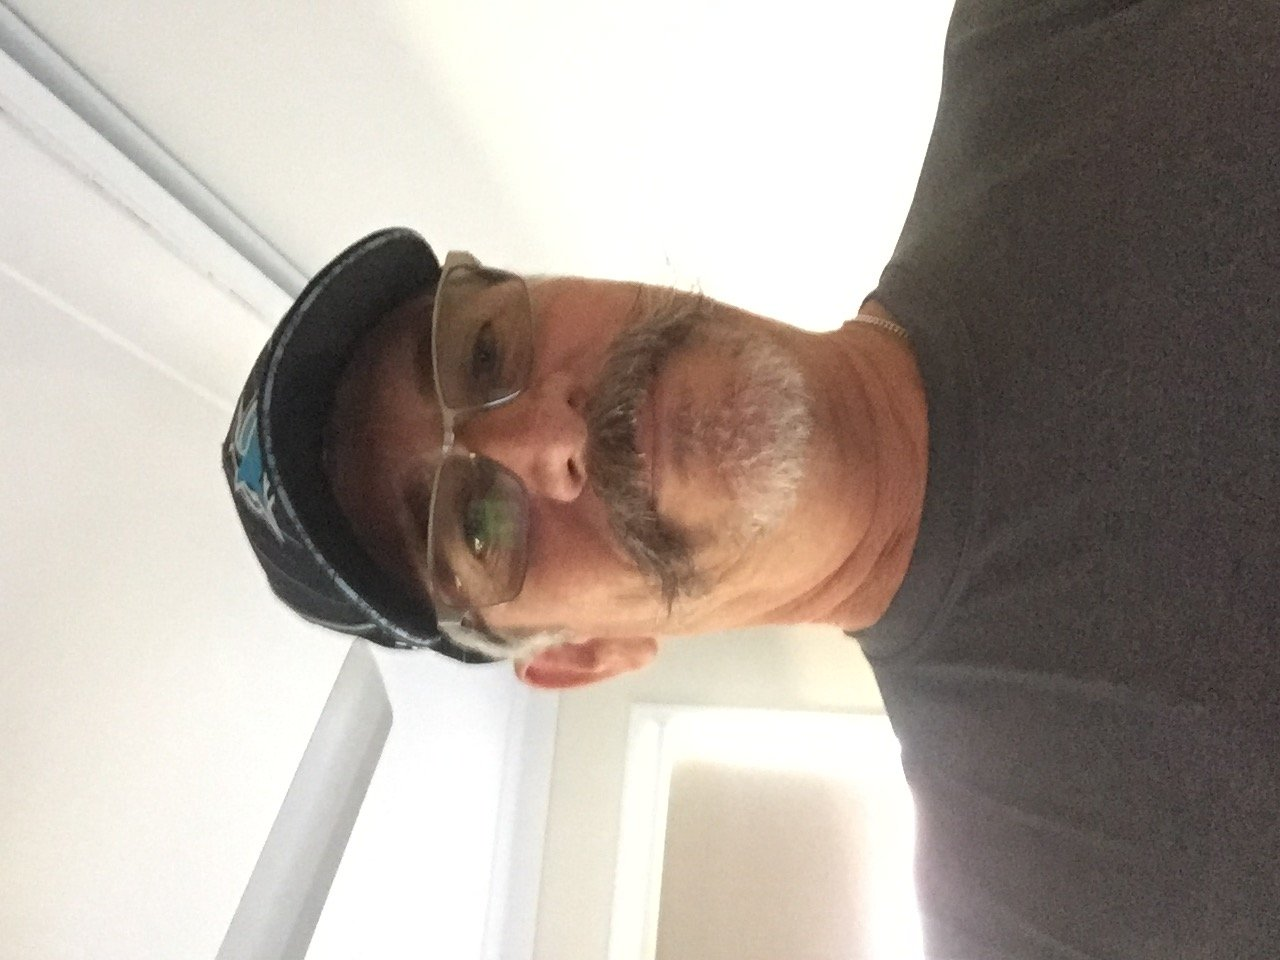 MisterMo from Queensland,Australia